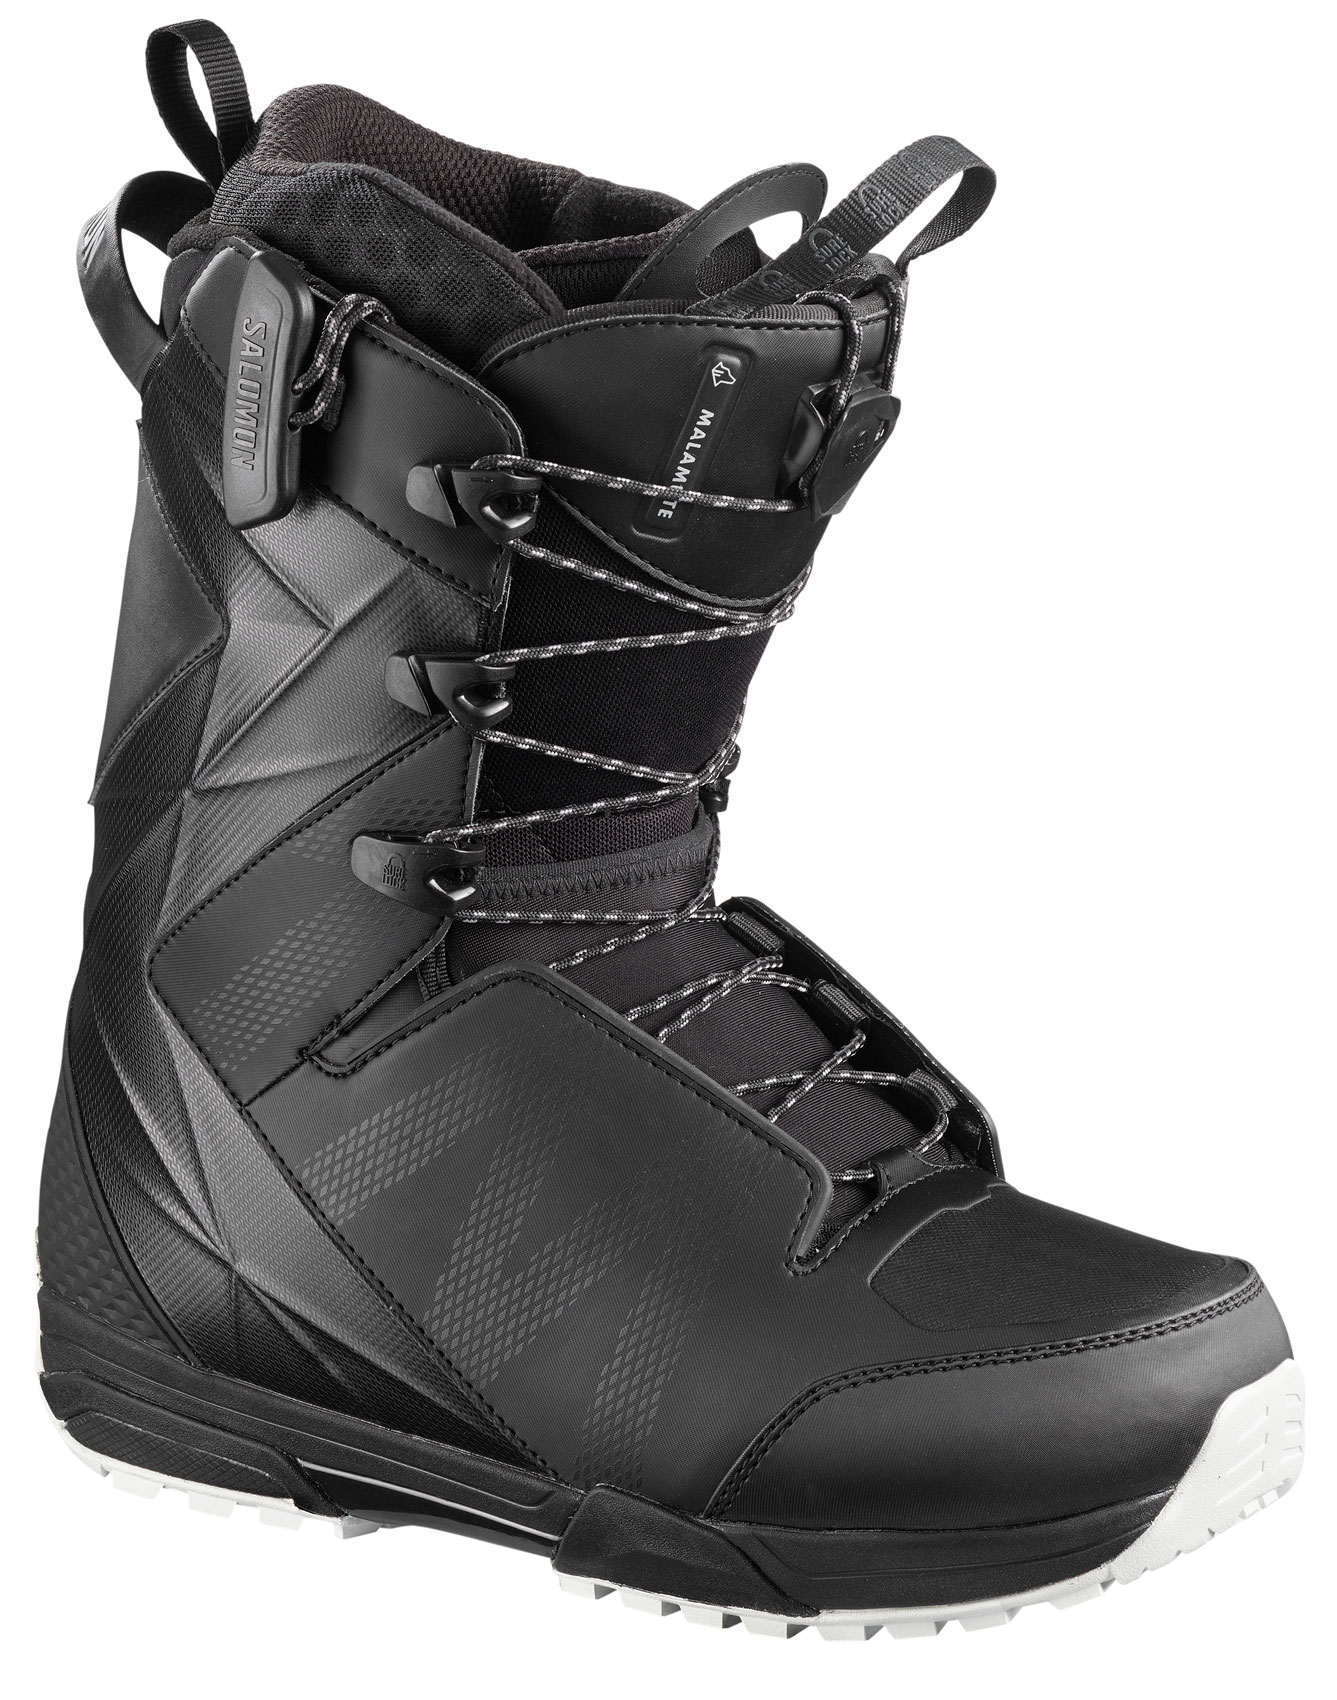 fdbf80aeaedb Salomon Malamute Snowboard Boots 2019